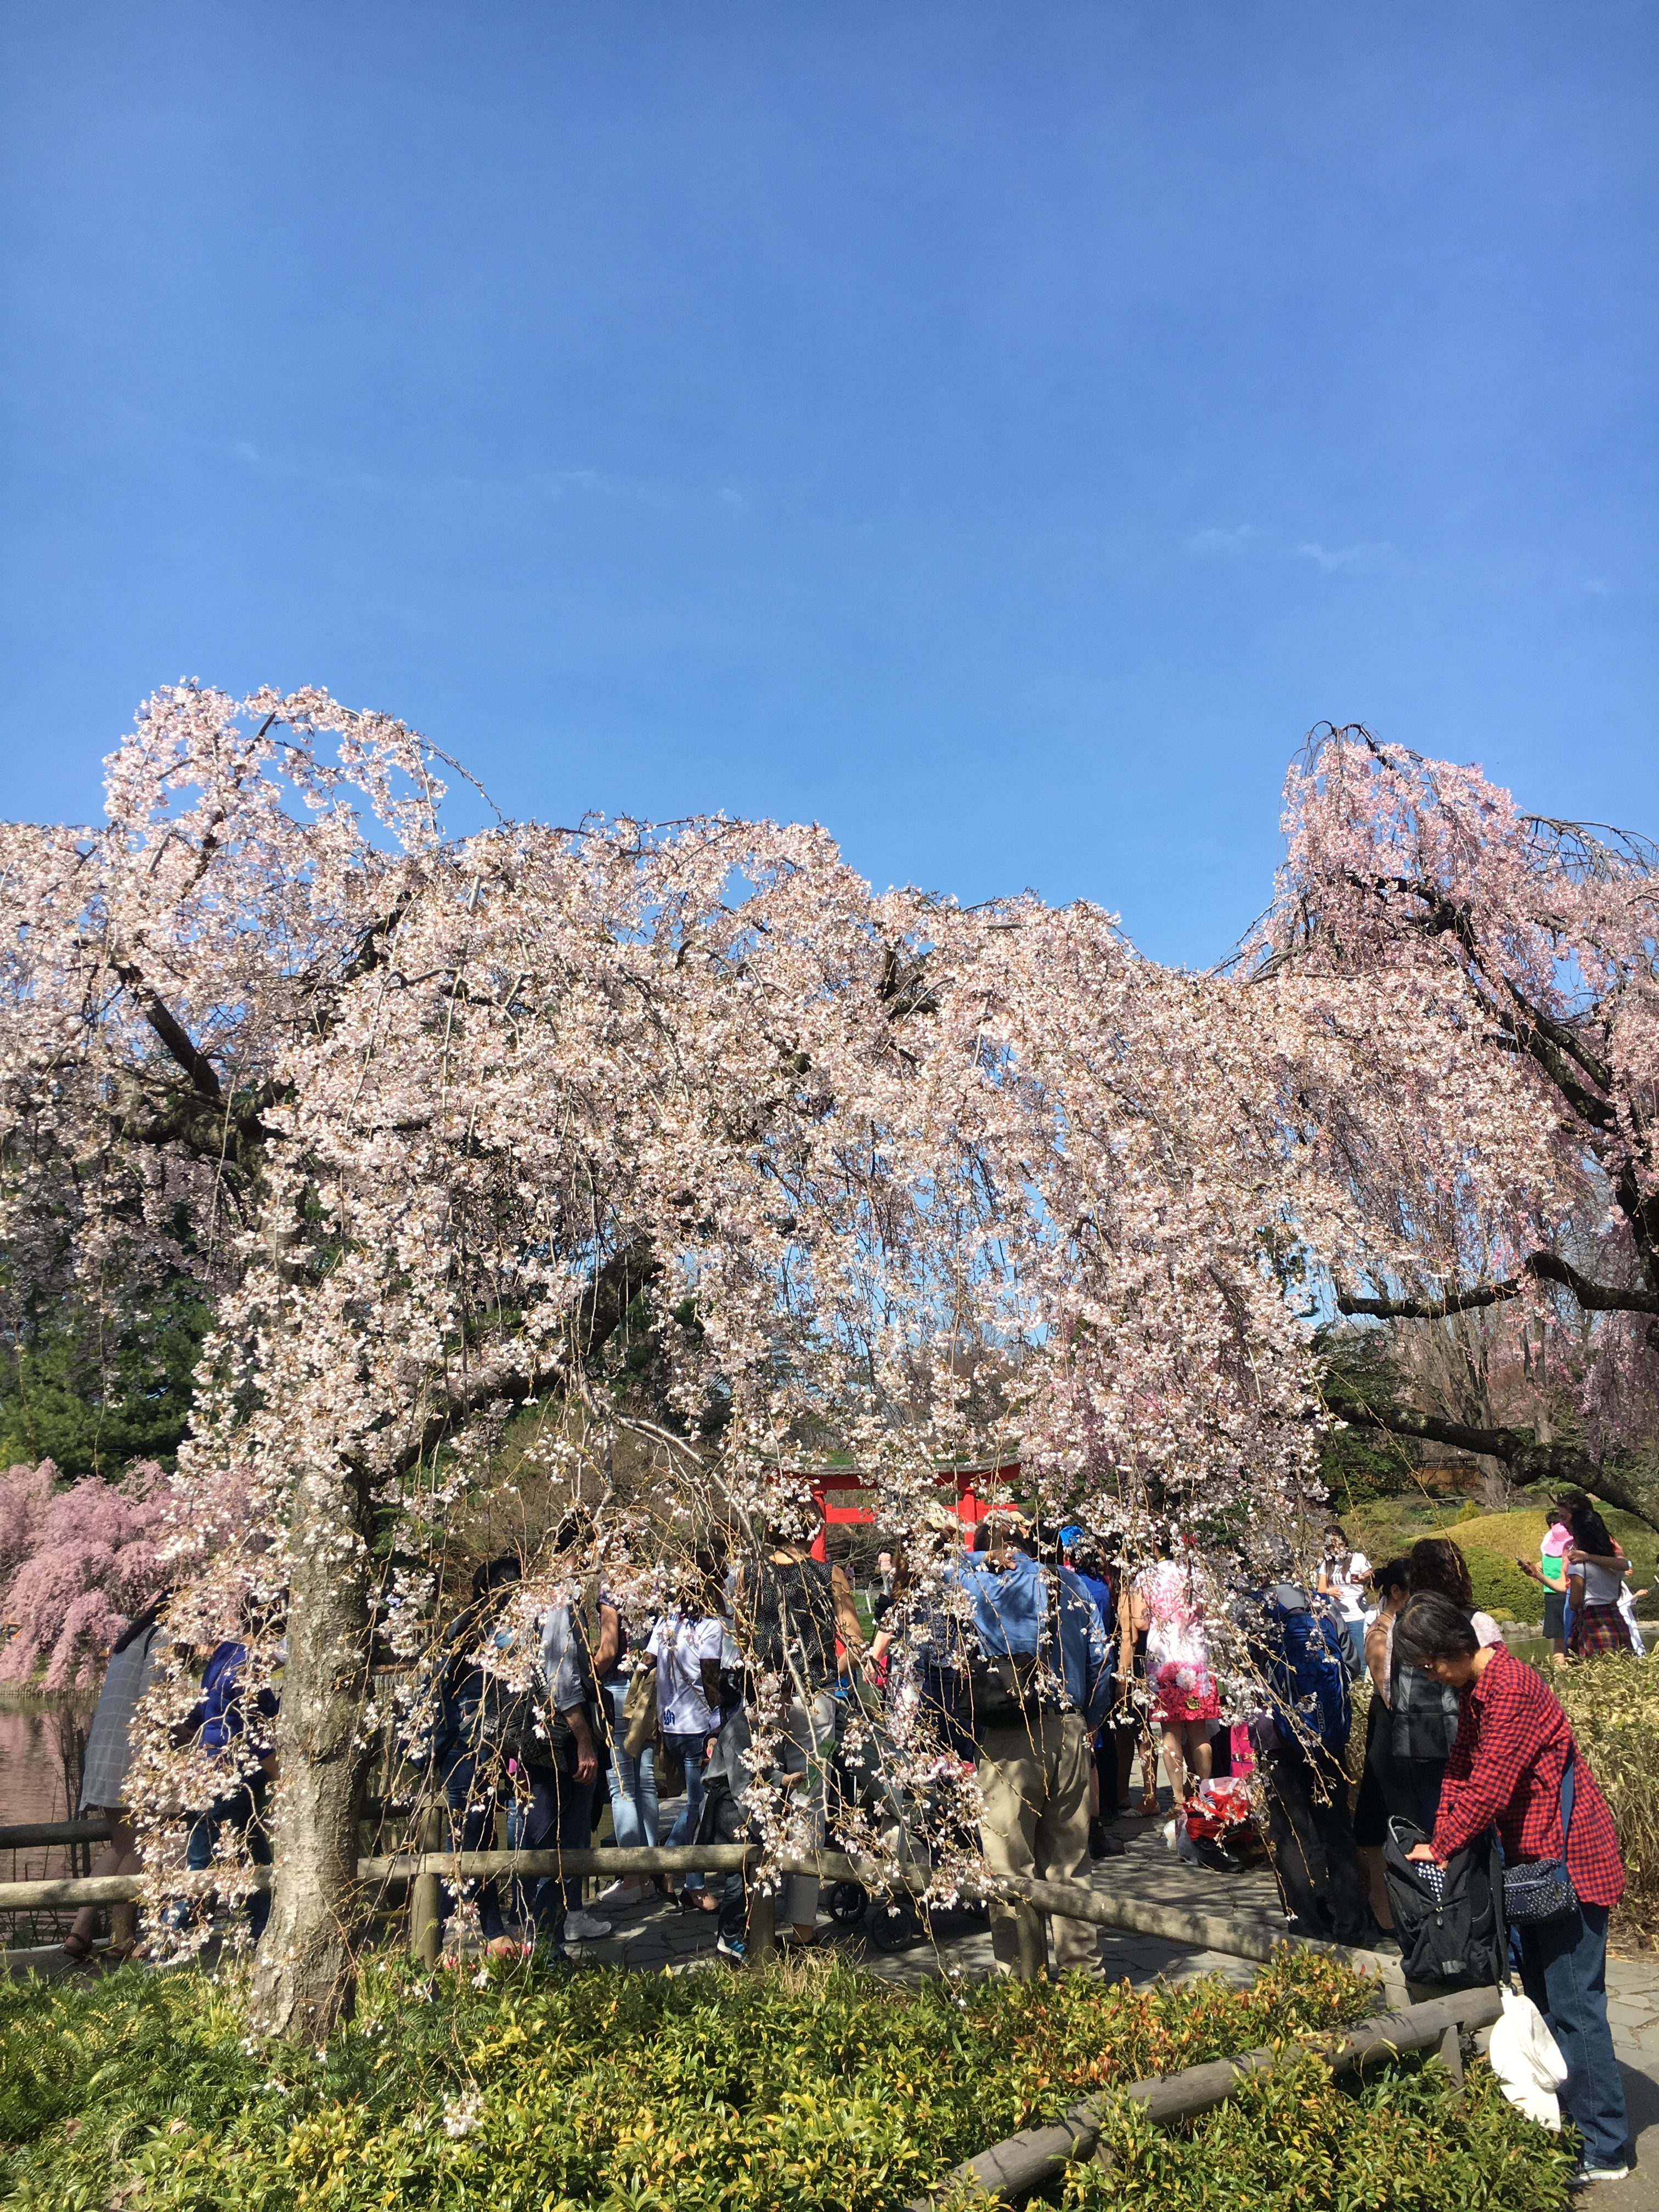 trees at brooklyn botanic garden